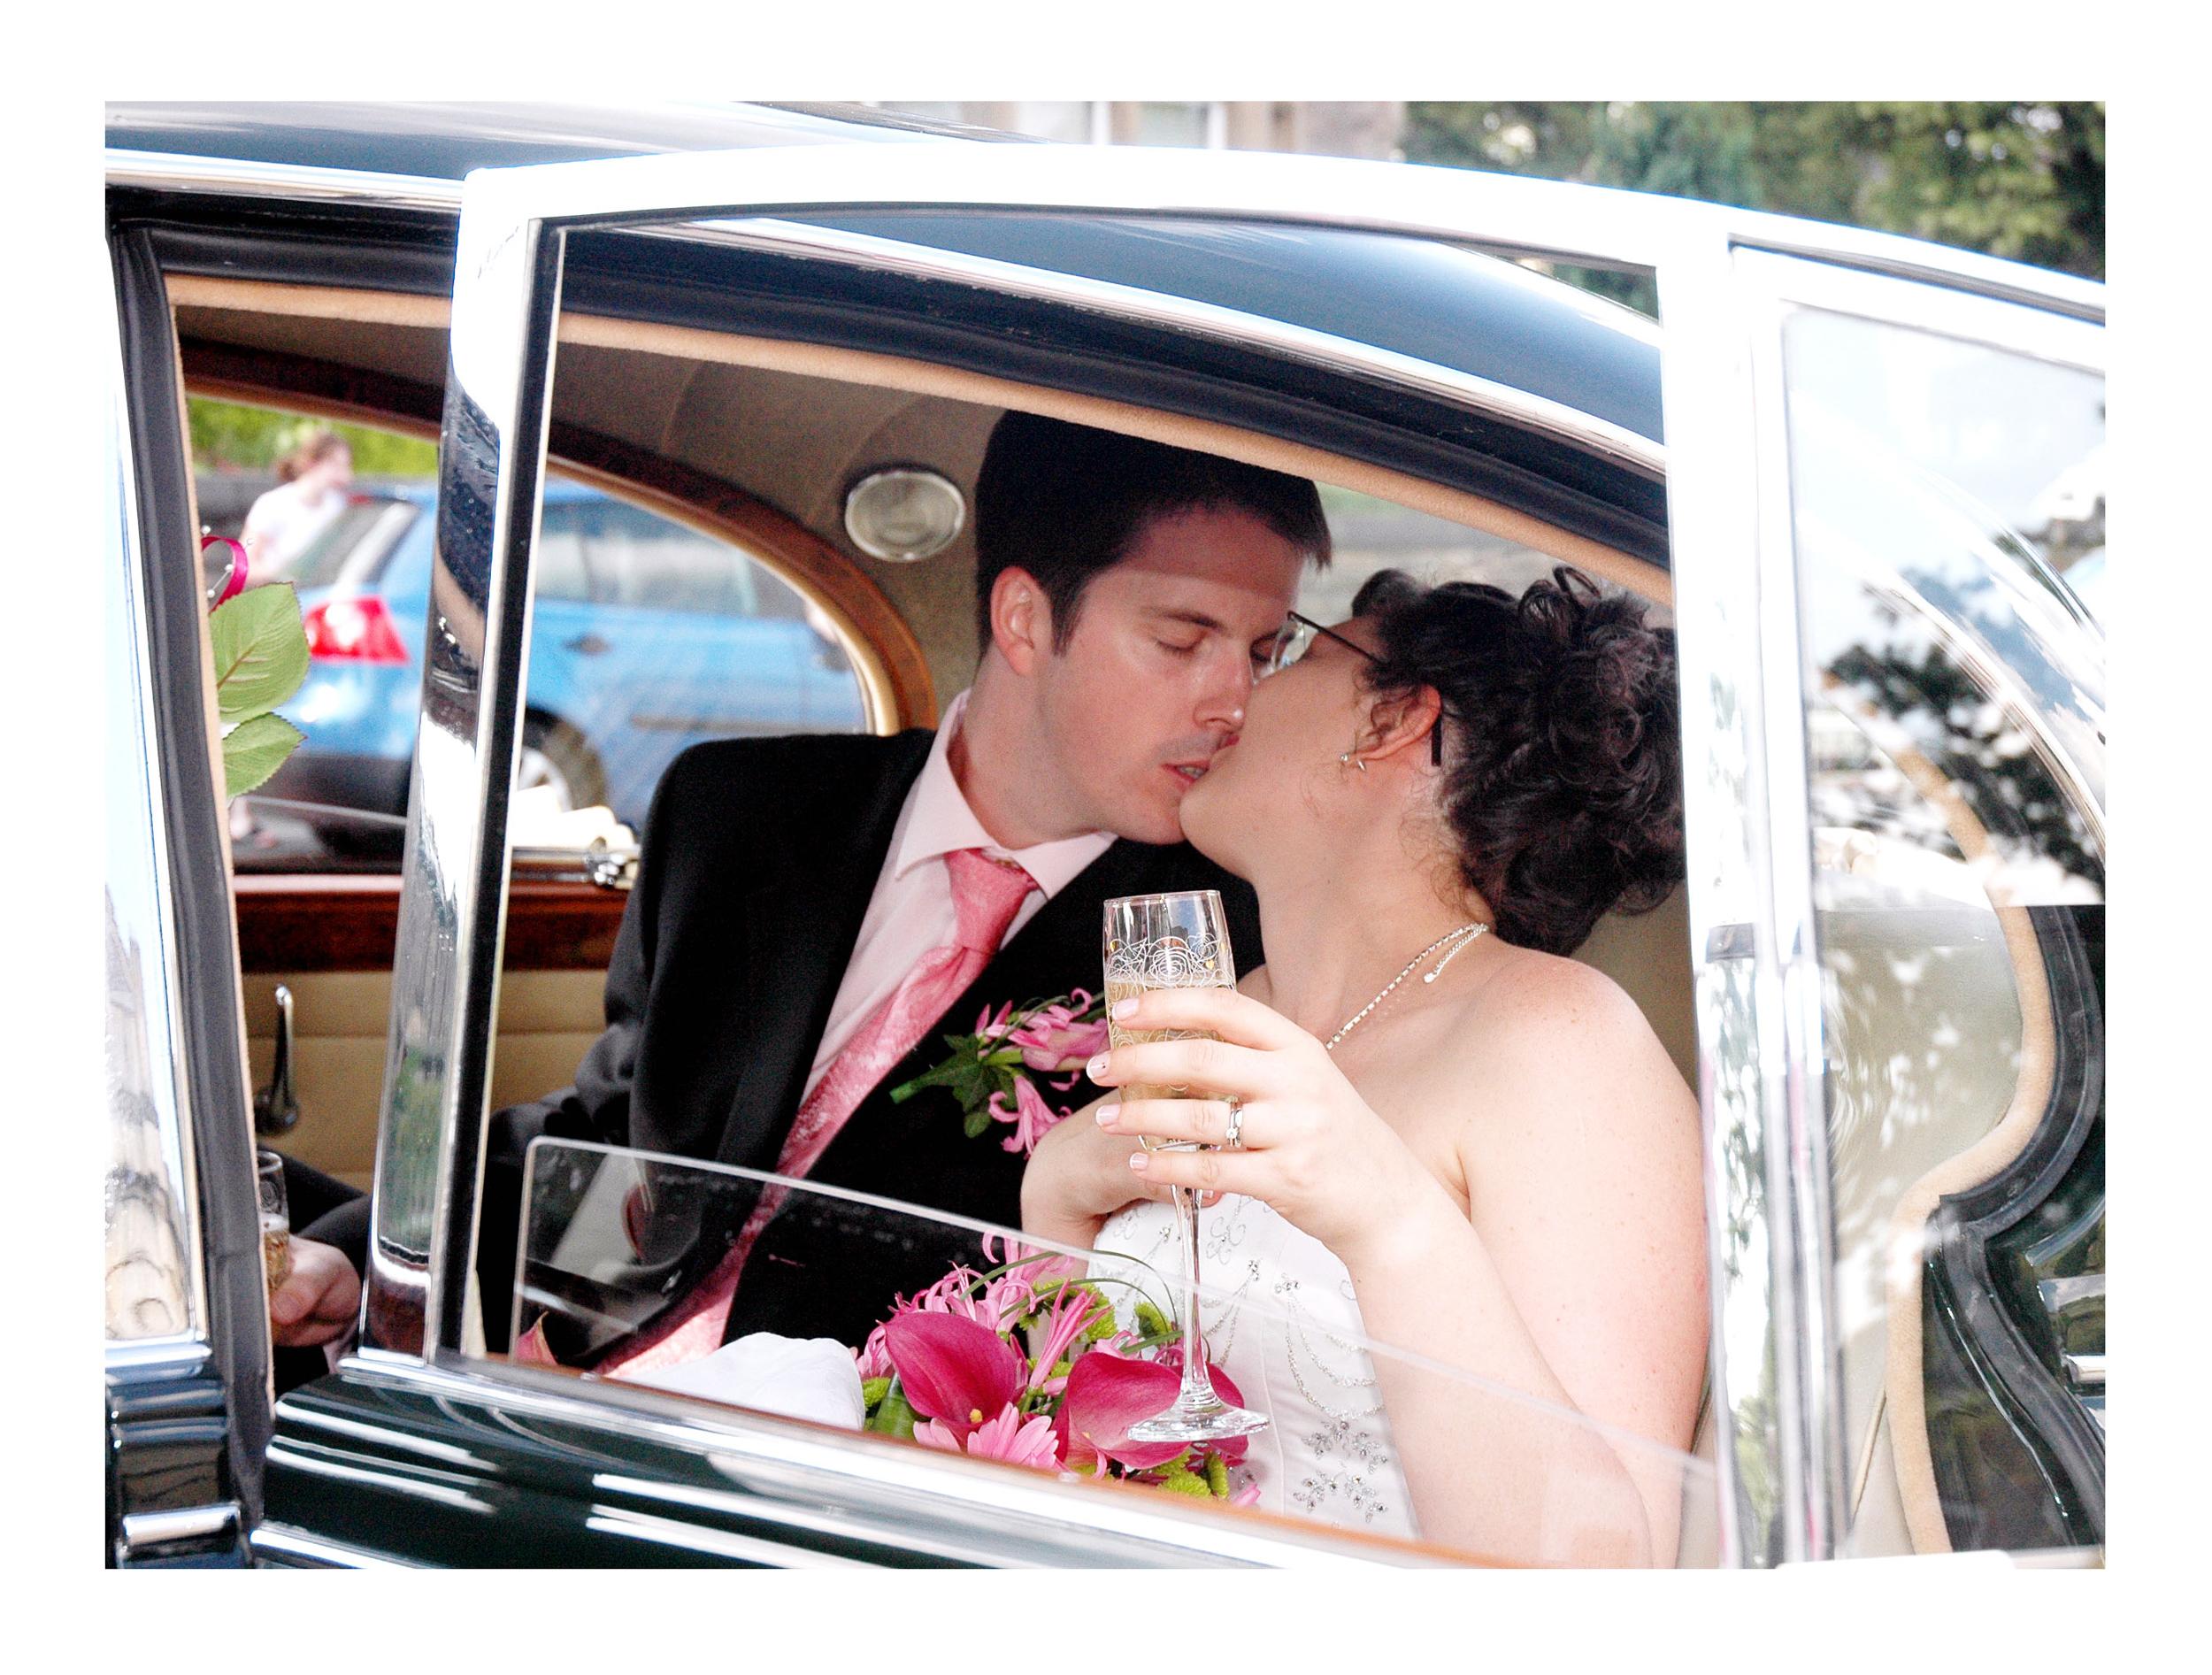 REPORTAGE-WEDDING-PHOTOGRAPHY-SET-UK-40.jpg